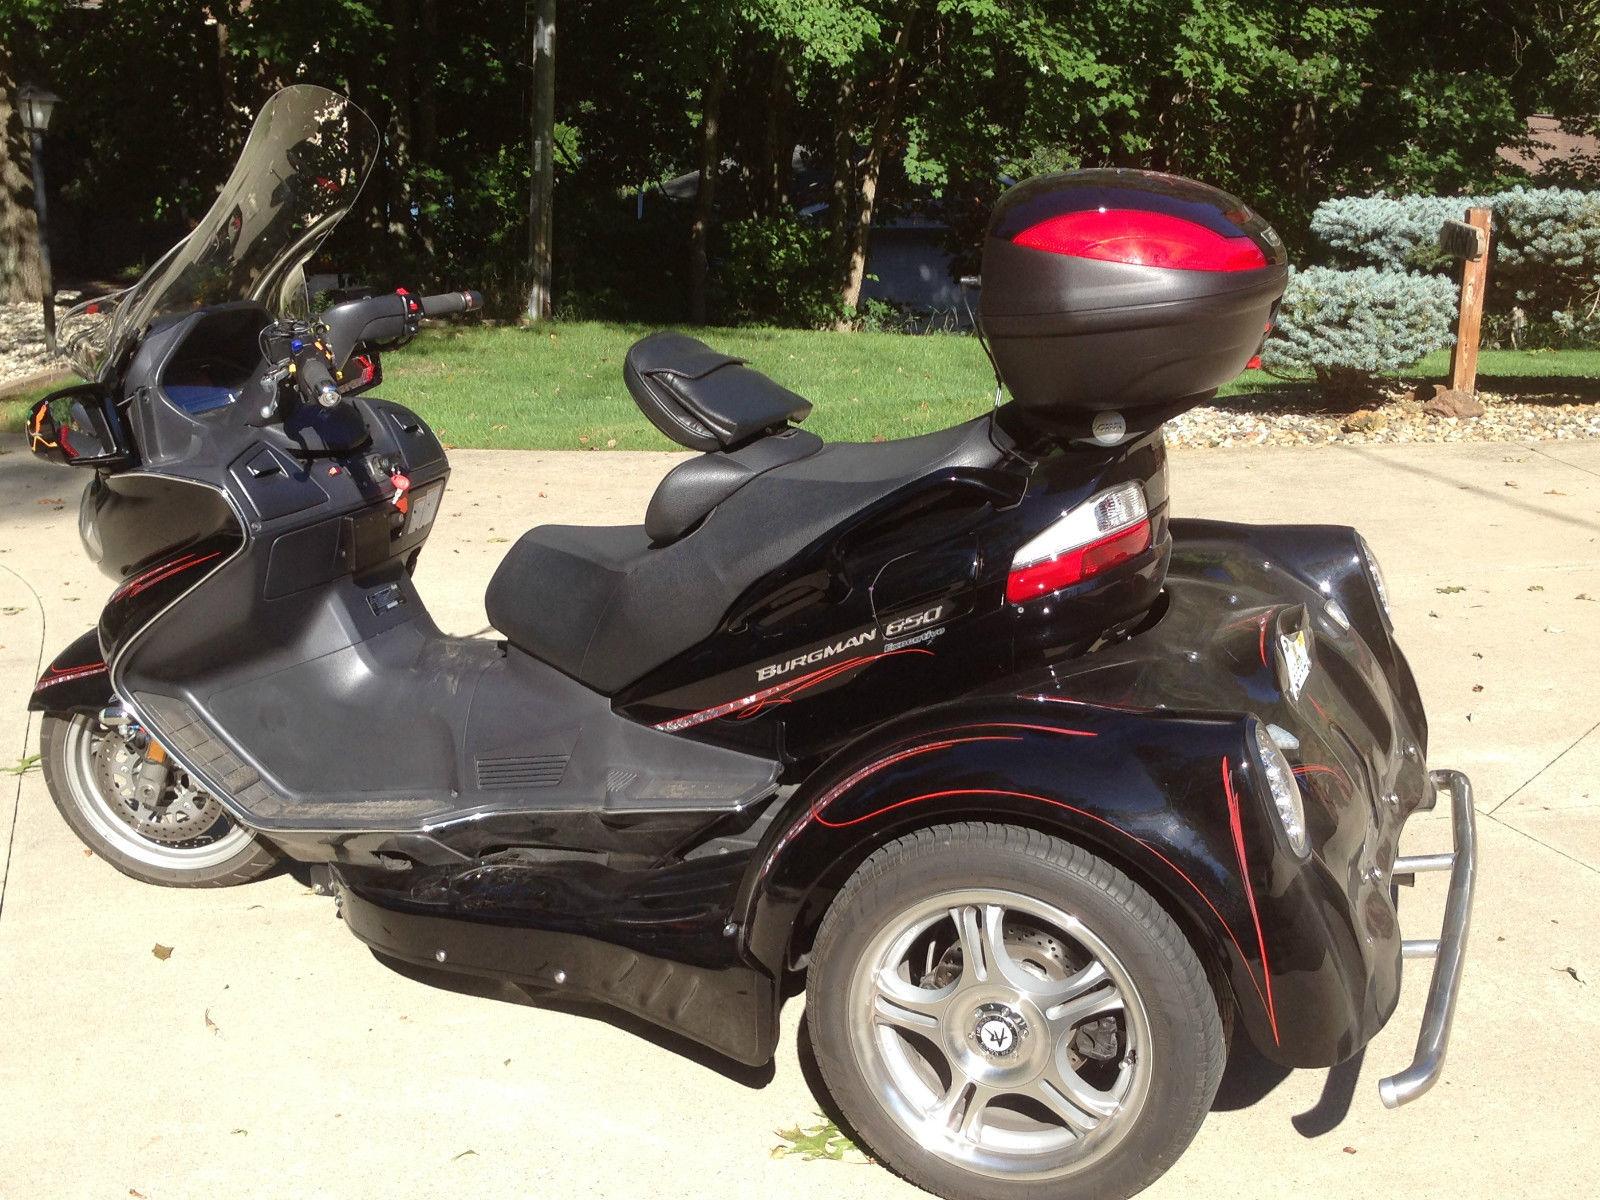 2009 suzuki burgman 650 exec scooter w falcon trike conversion. Black Bedroom Furniture Sets. Home Design Ideas